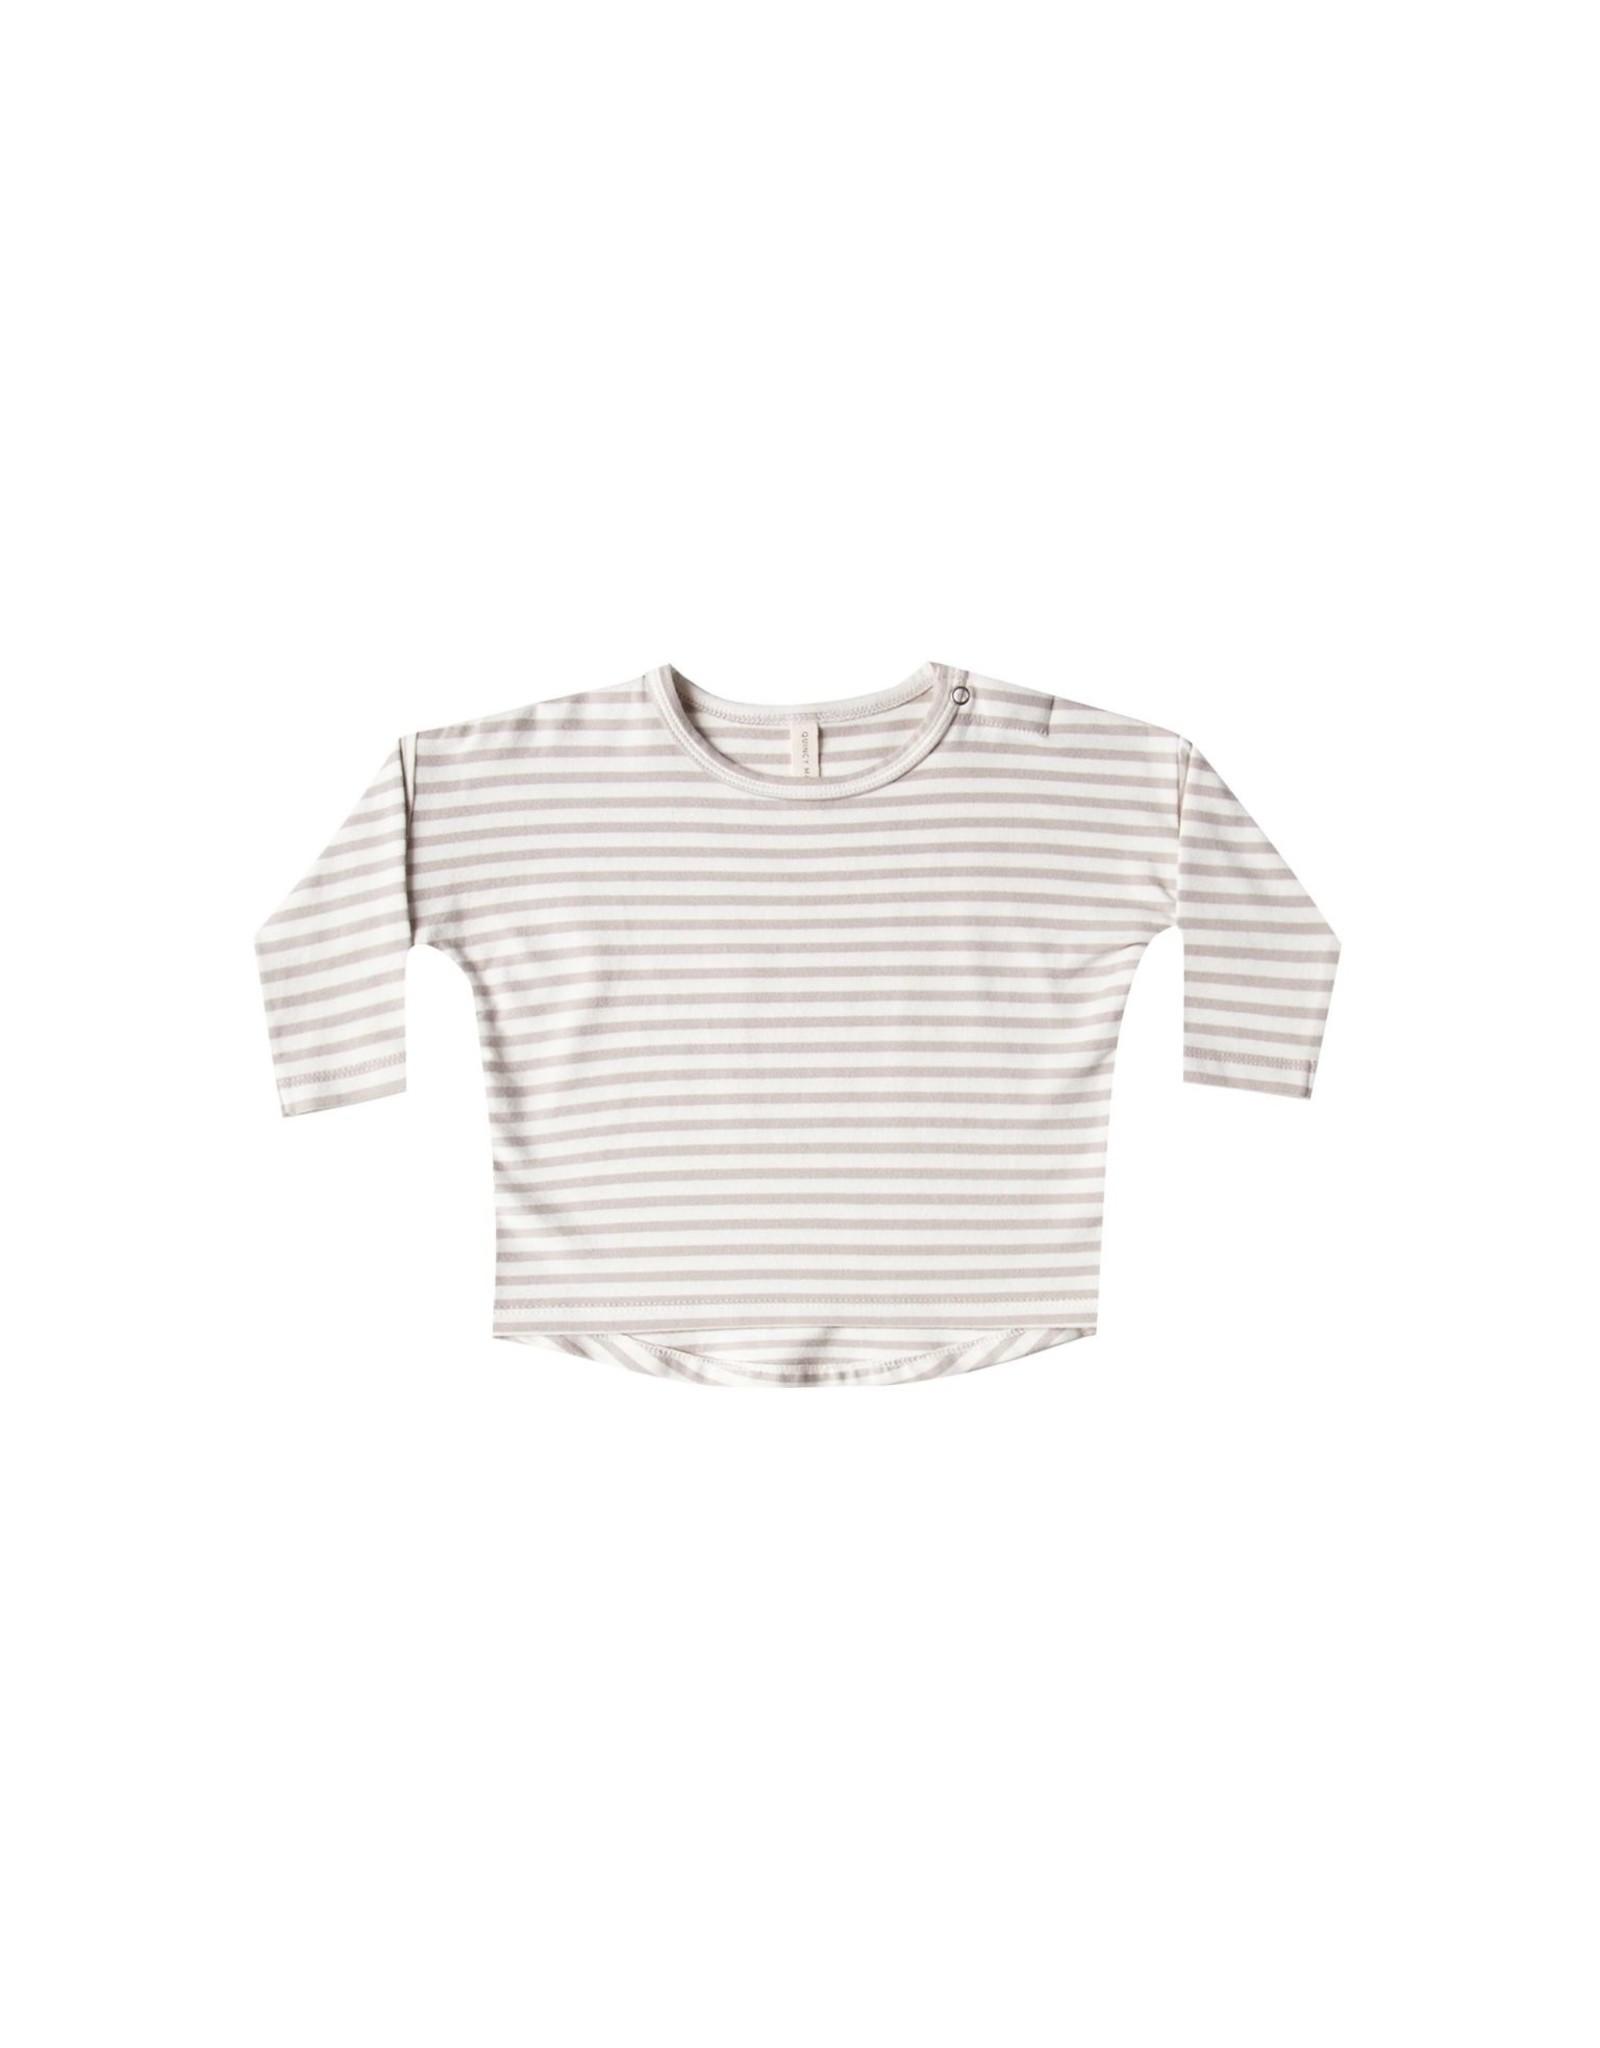 Quincy Mae l/s baby tee- fog stripe